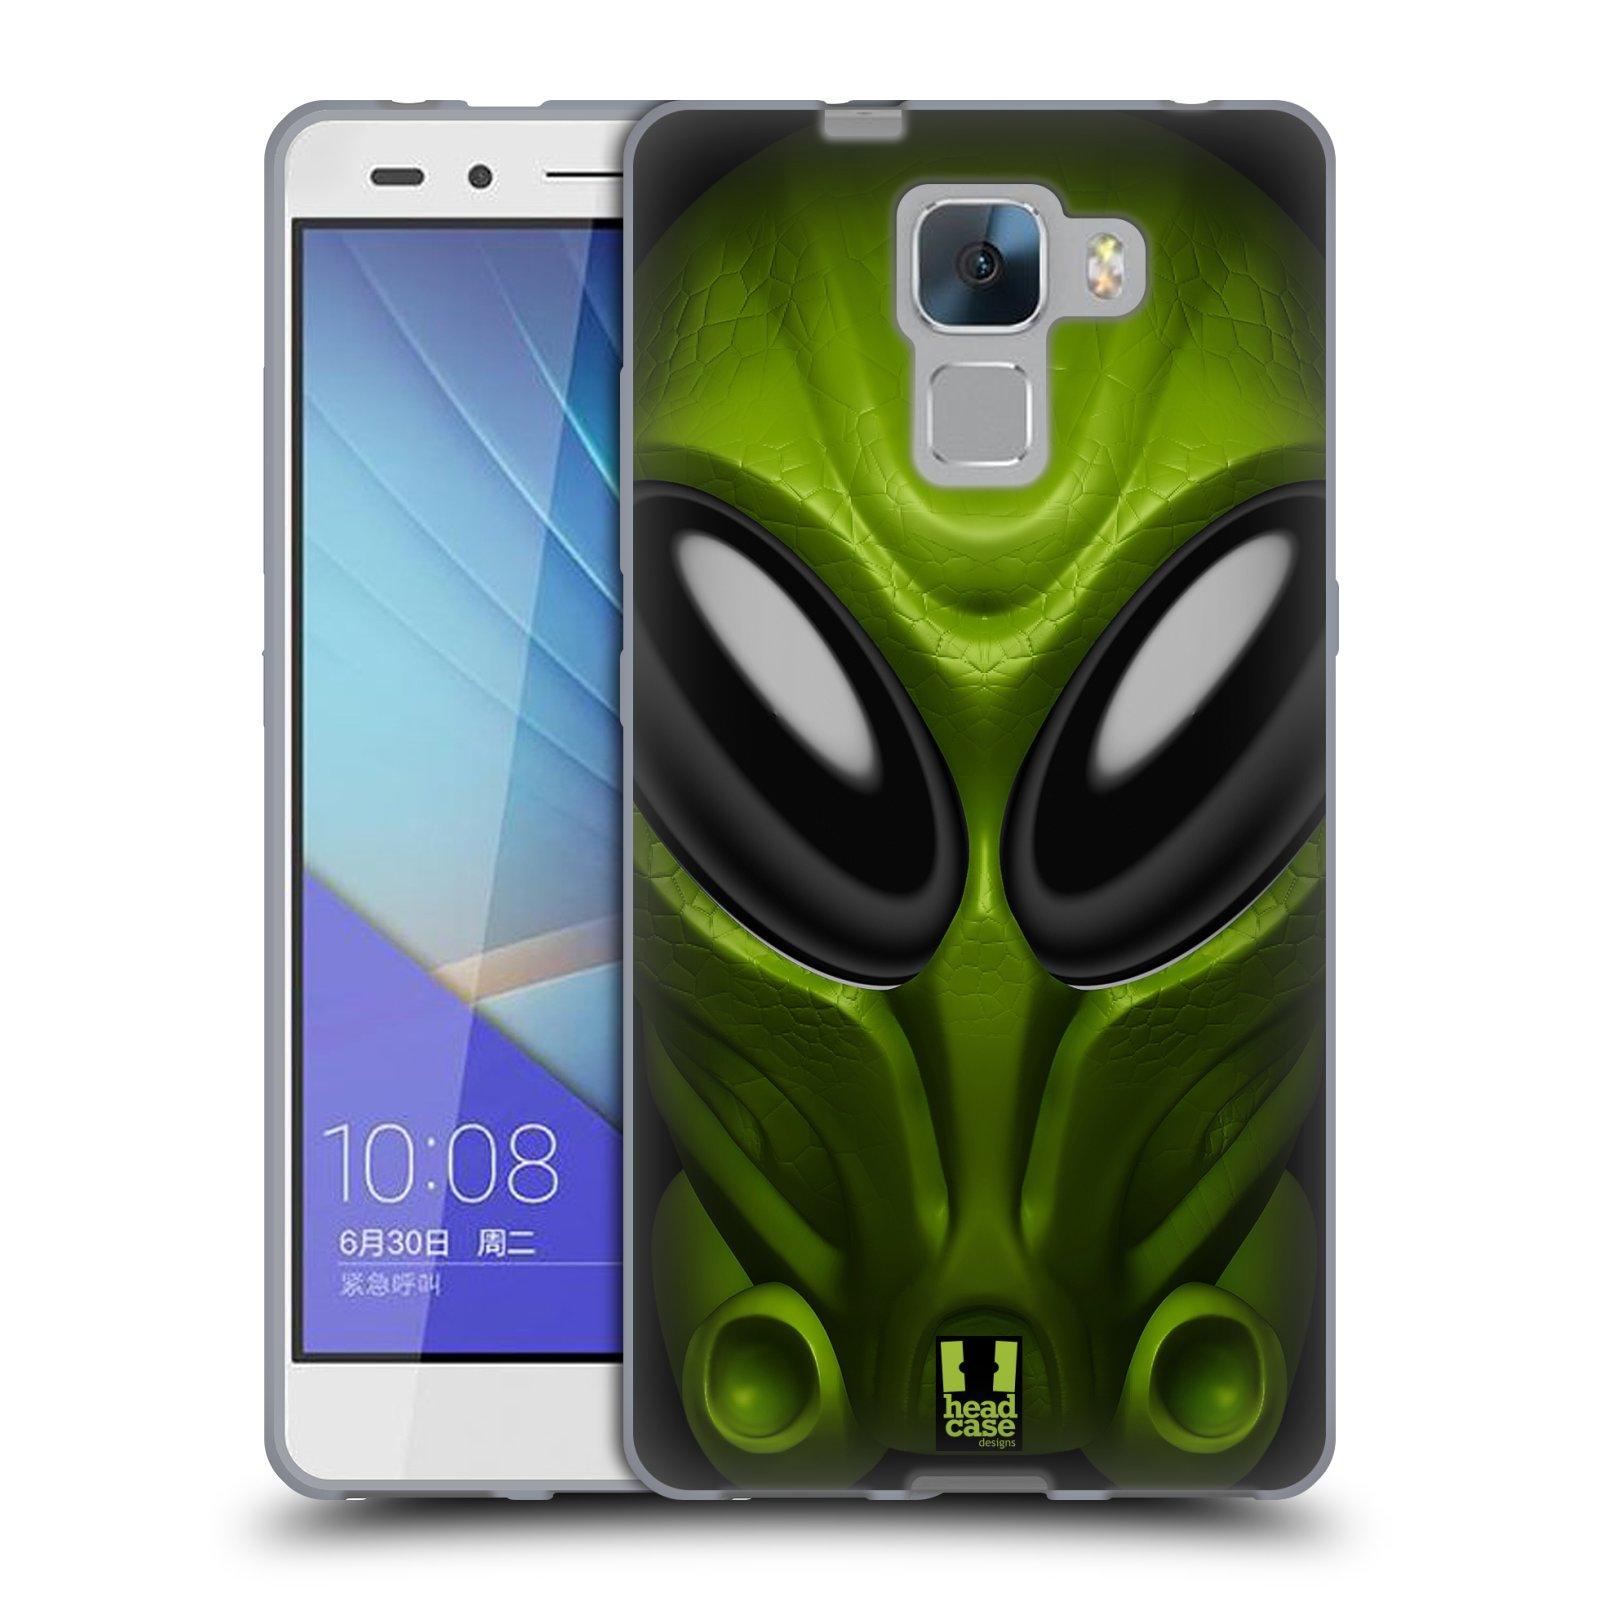 Silikonové pouzdro na mobil Honor 7 - Head Case - Ufoun Mastermind